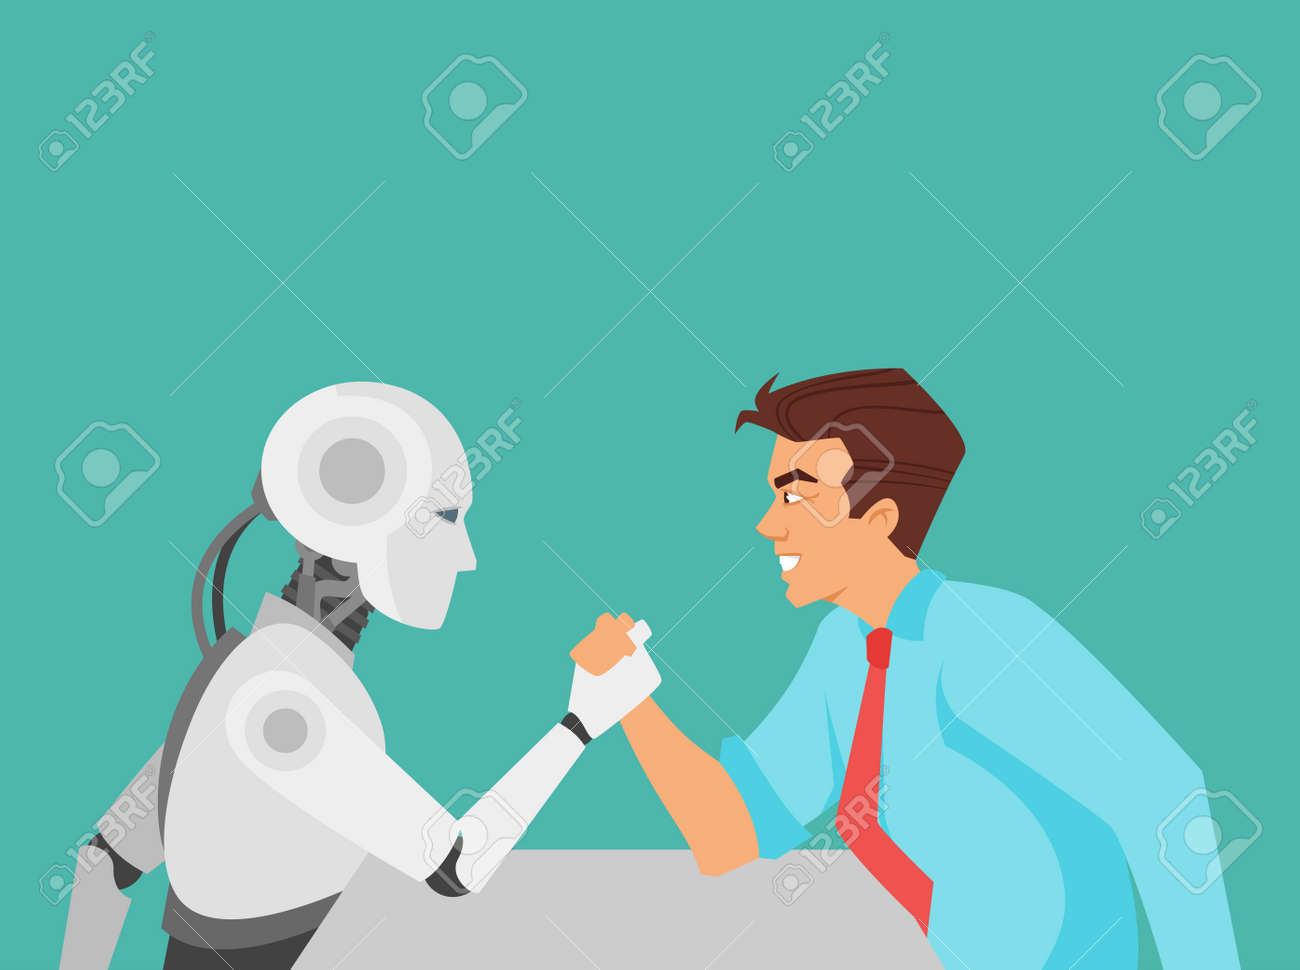 Vector cartoon style illustration of human aggressive businessman vs robot confrontation arm wrestling. Modern technology concept. - 91781701